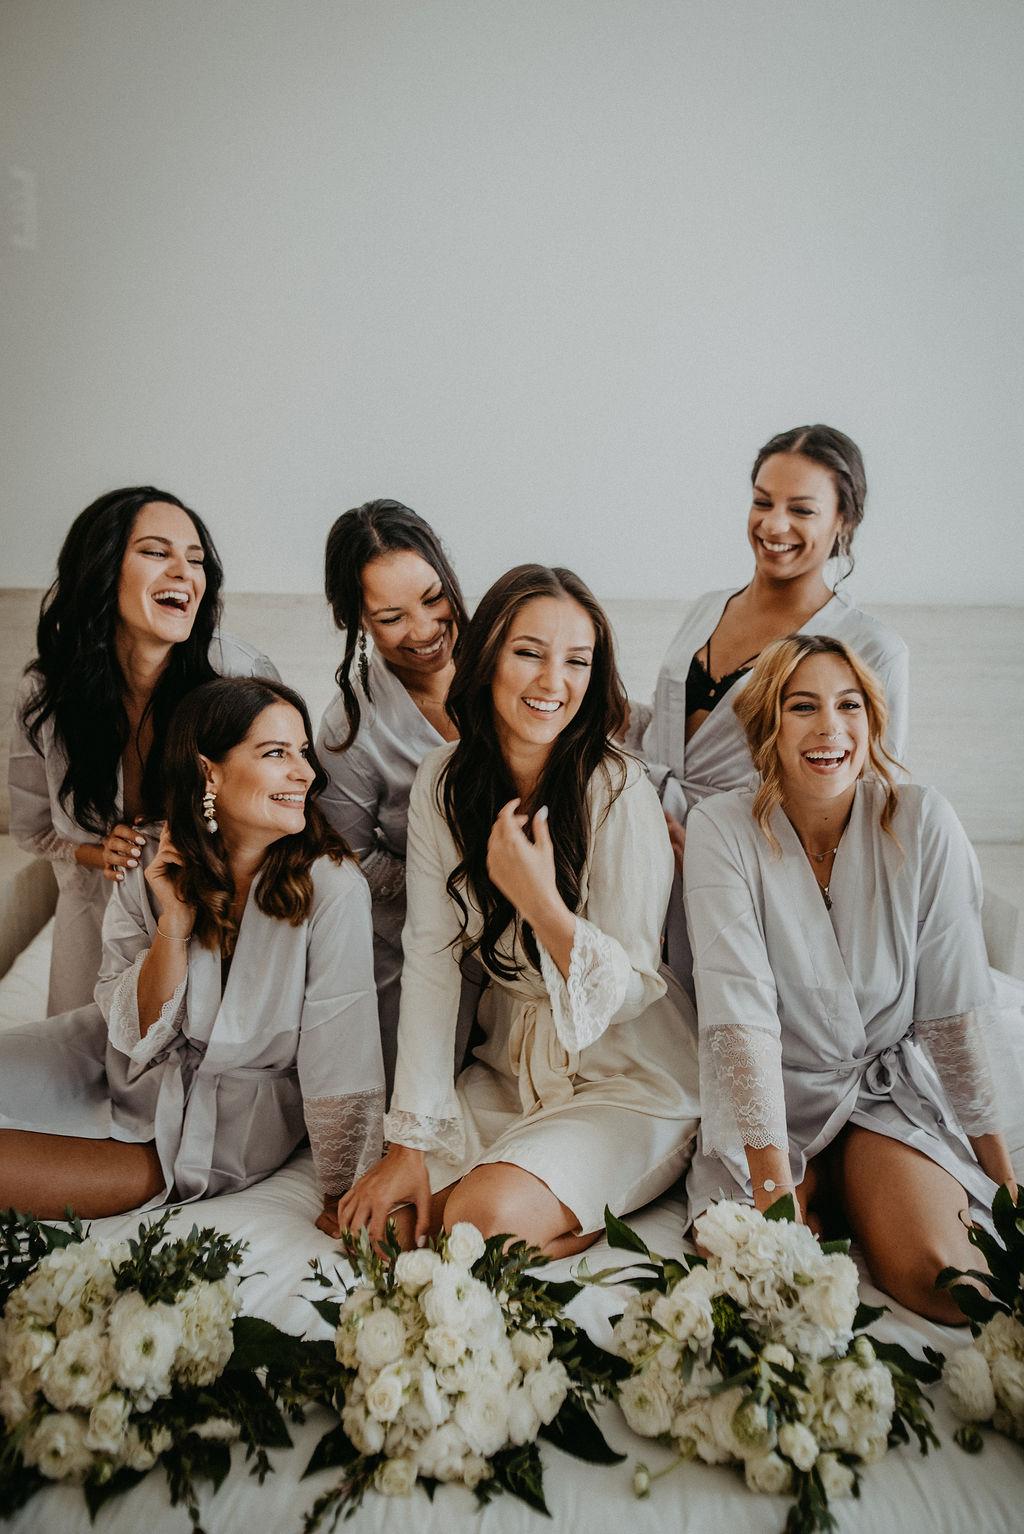 julieth-bravo-boda-destino-colombia-destination-bridesmaids-germany-love.jpg